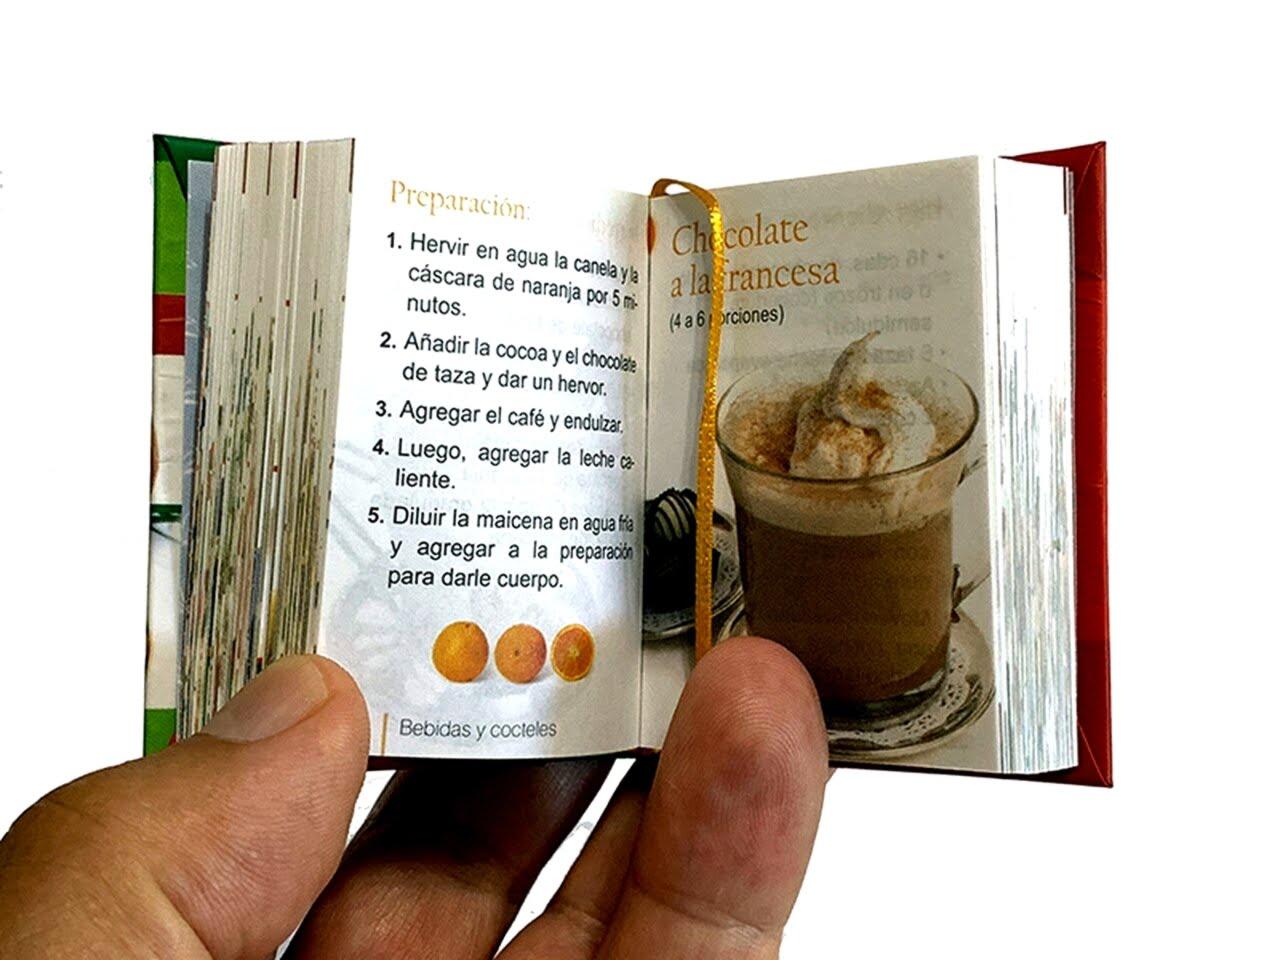 comida-casera-coleccion-2-miniature-book-libro